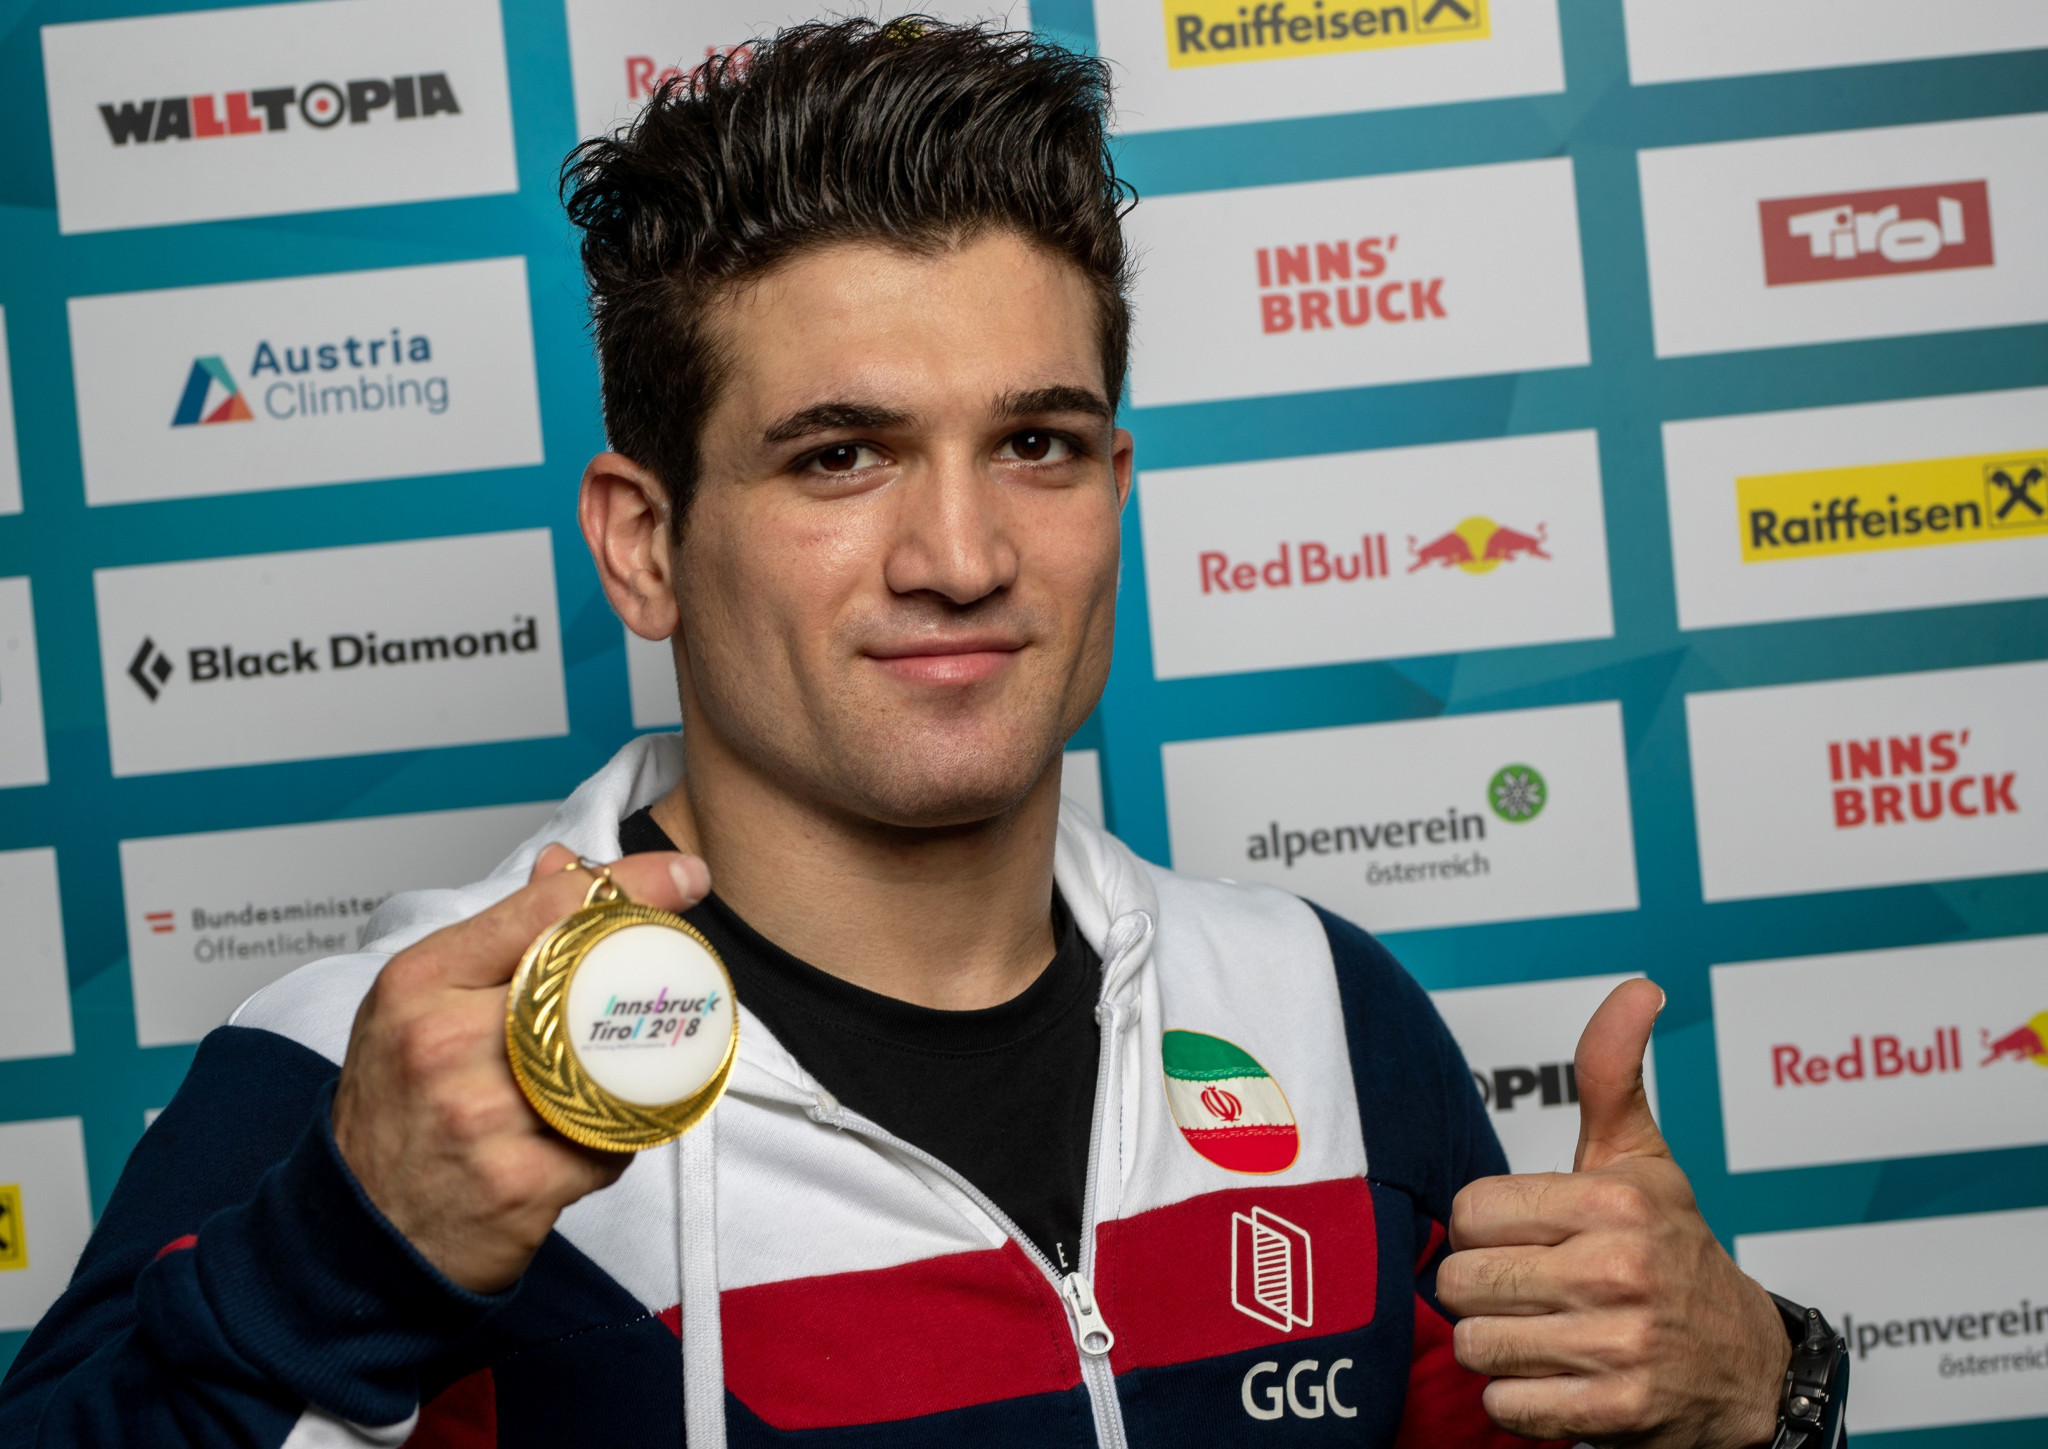 Iranian climber Alipour aims for Paris 2024 gold